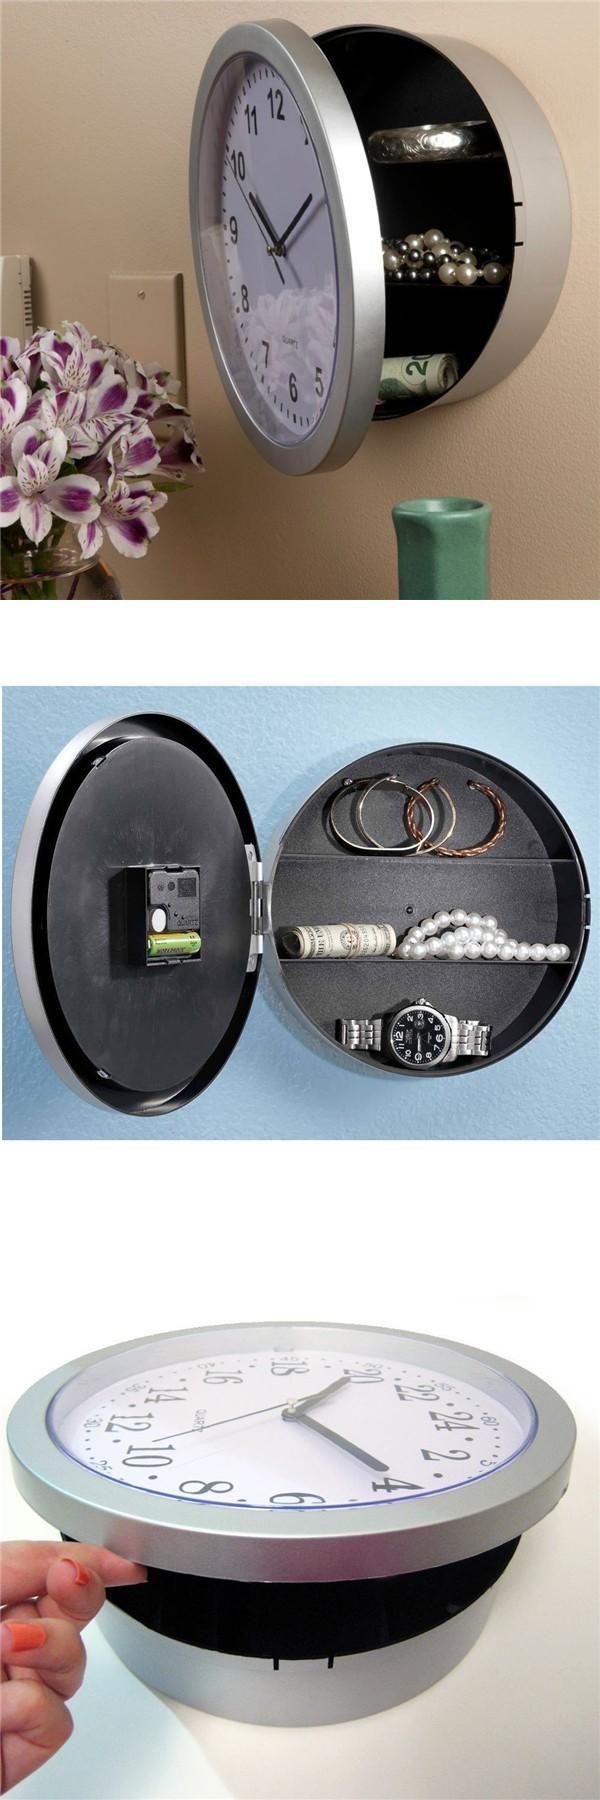 [Visit to Buy] Wall Clock Hidden Secret Safe Box for Cash Money Jewelry Storage Security Safes #Advertisement